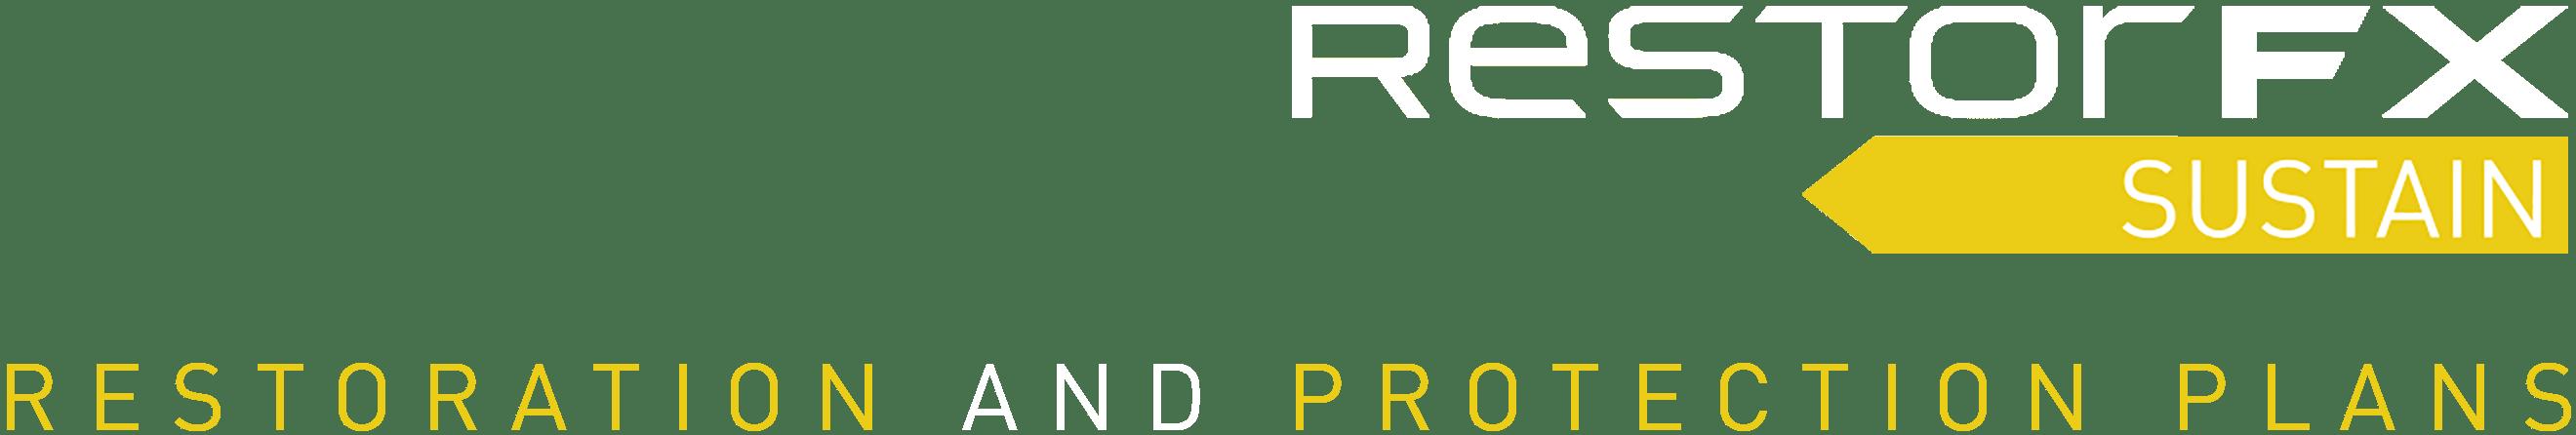 restorfx-sustain_logotype@2x